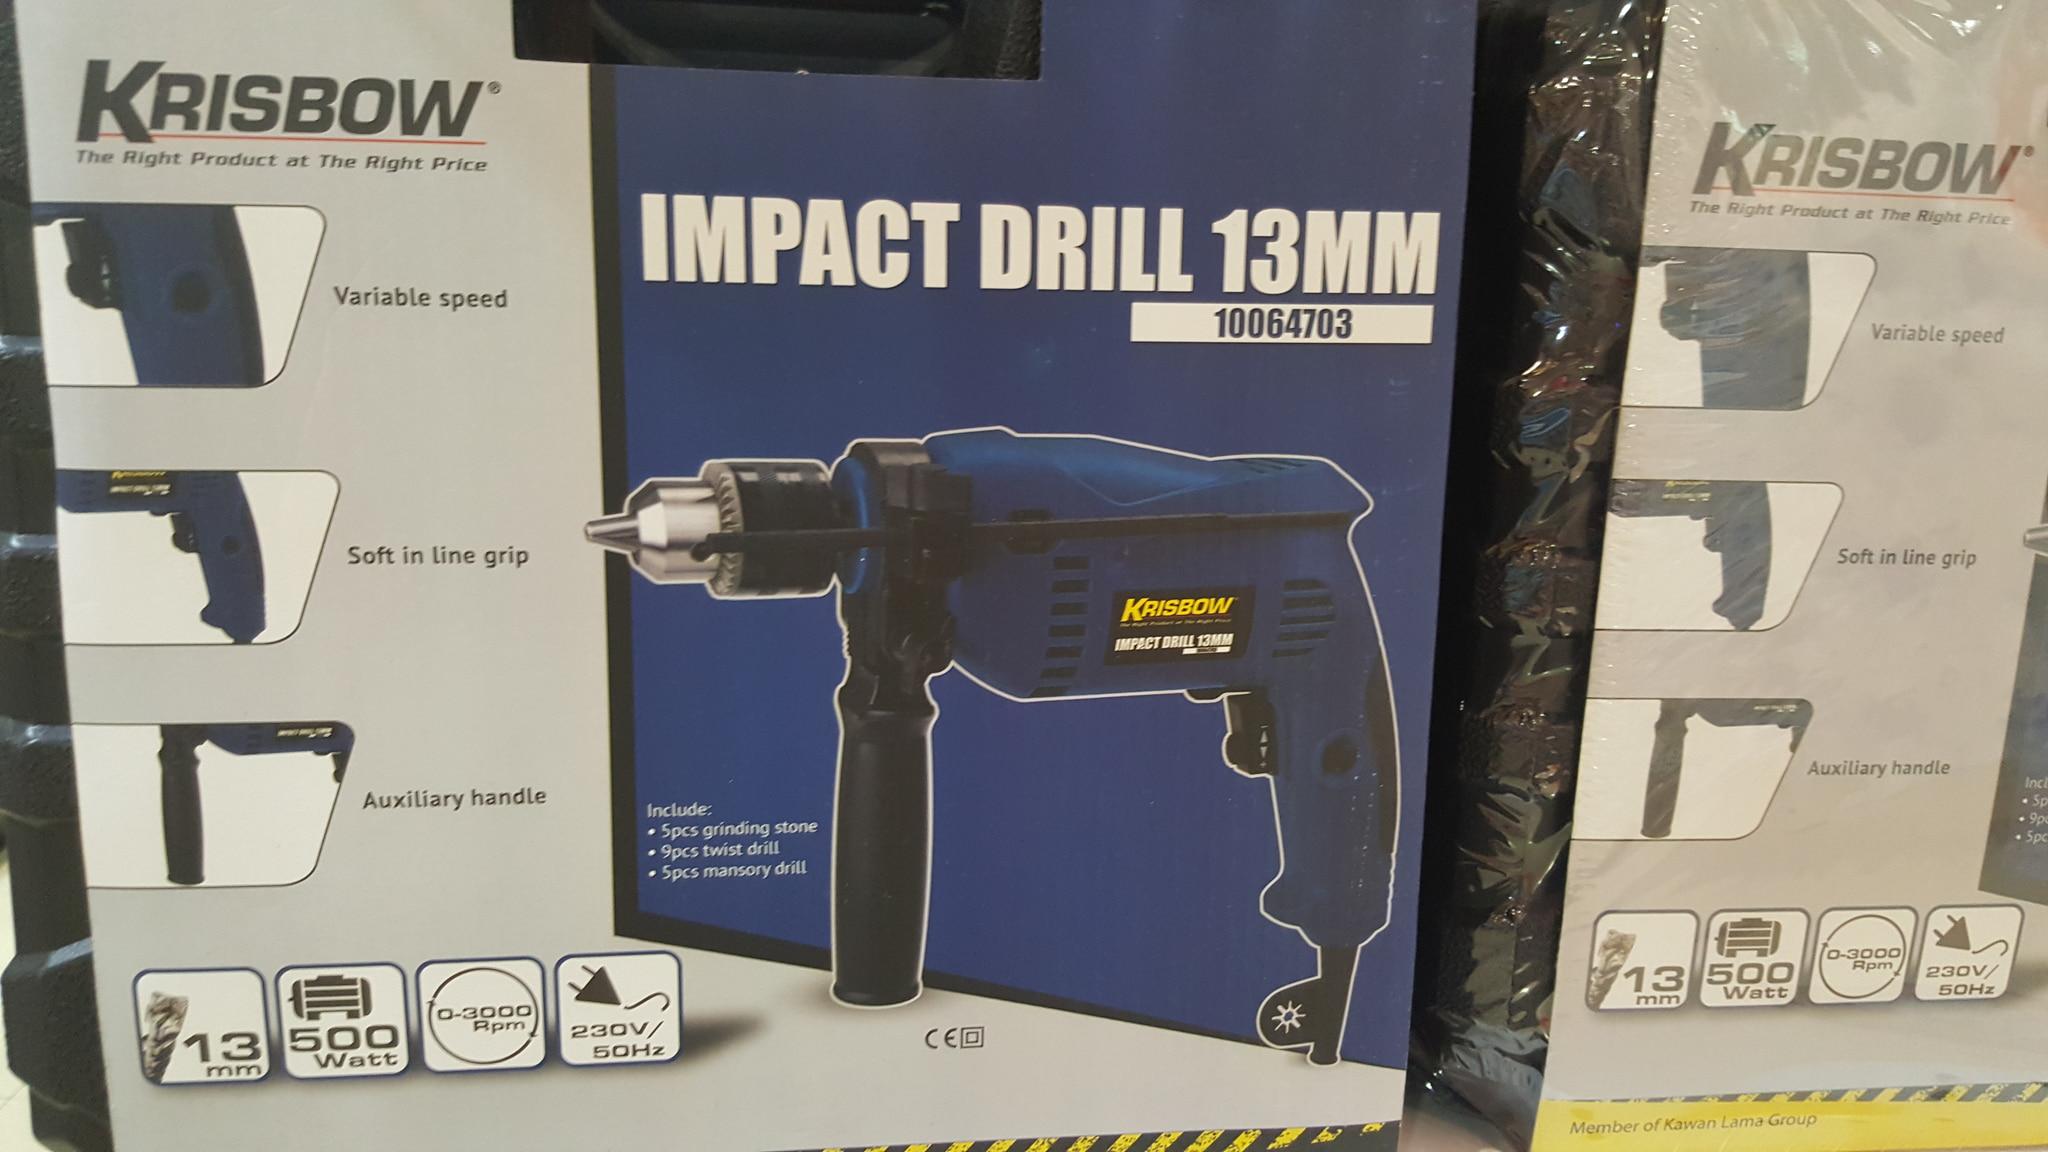 Krisbow Impact Drill 13MM 10064703 / Alat Bor Merk Krisbow